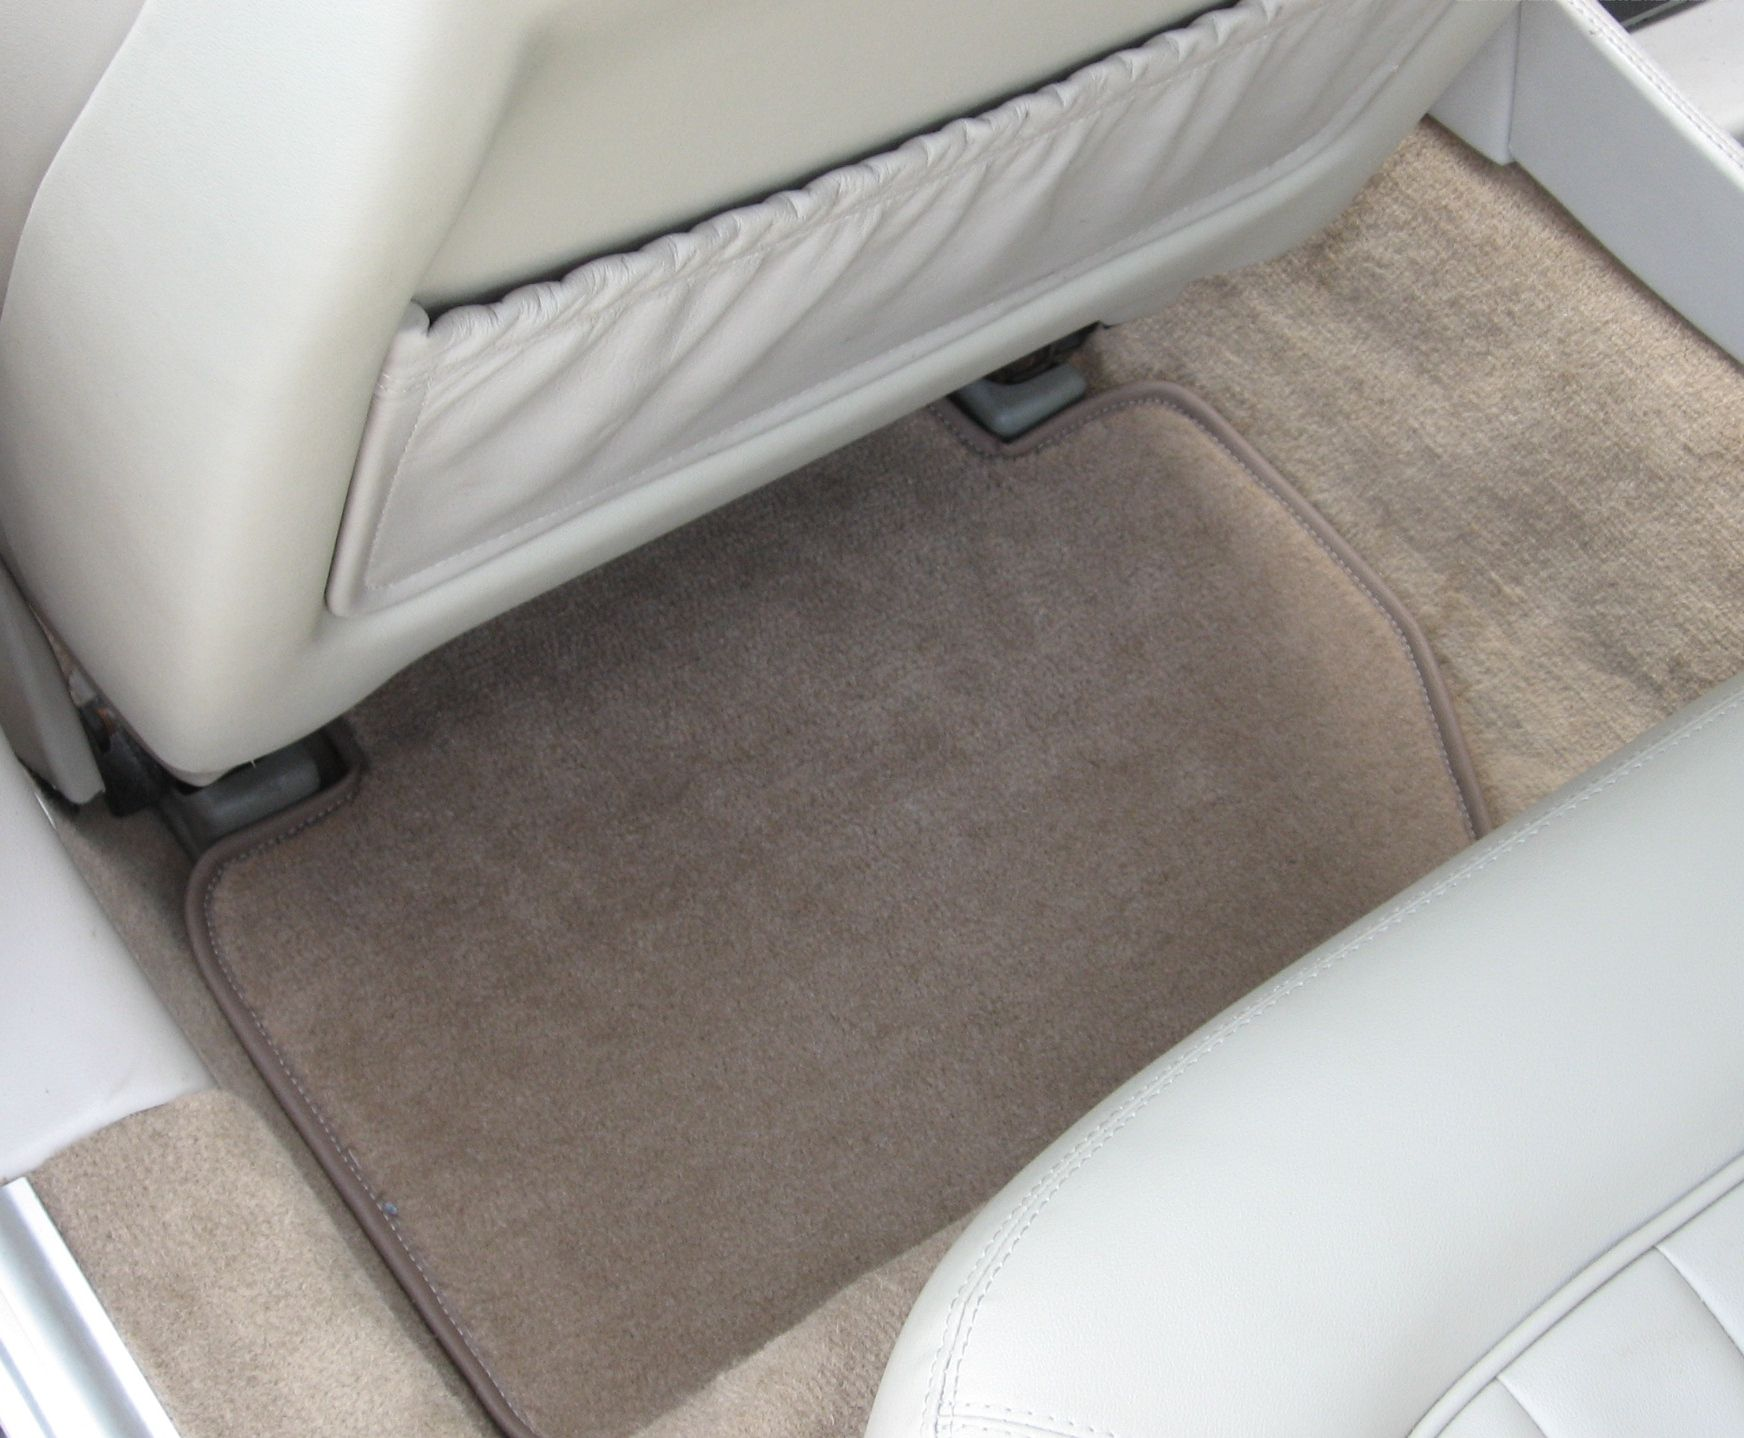 floor itm mats tailored sapp k image jaguar is ebay grey ribb loading xkr